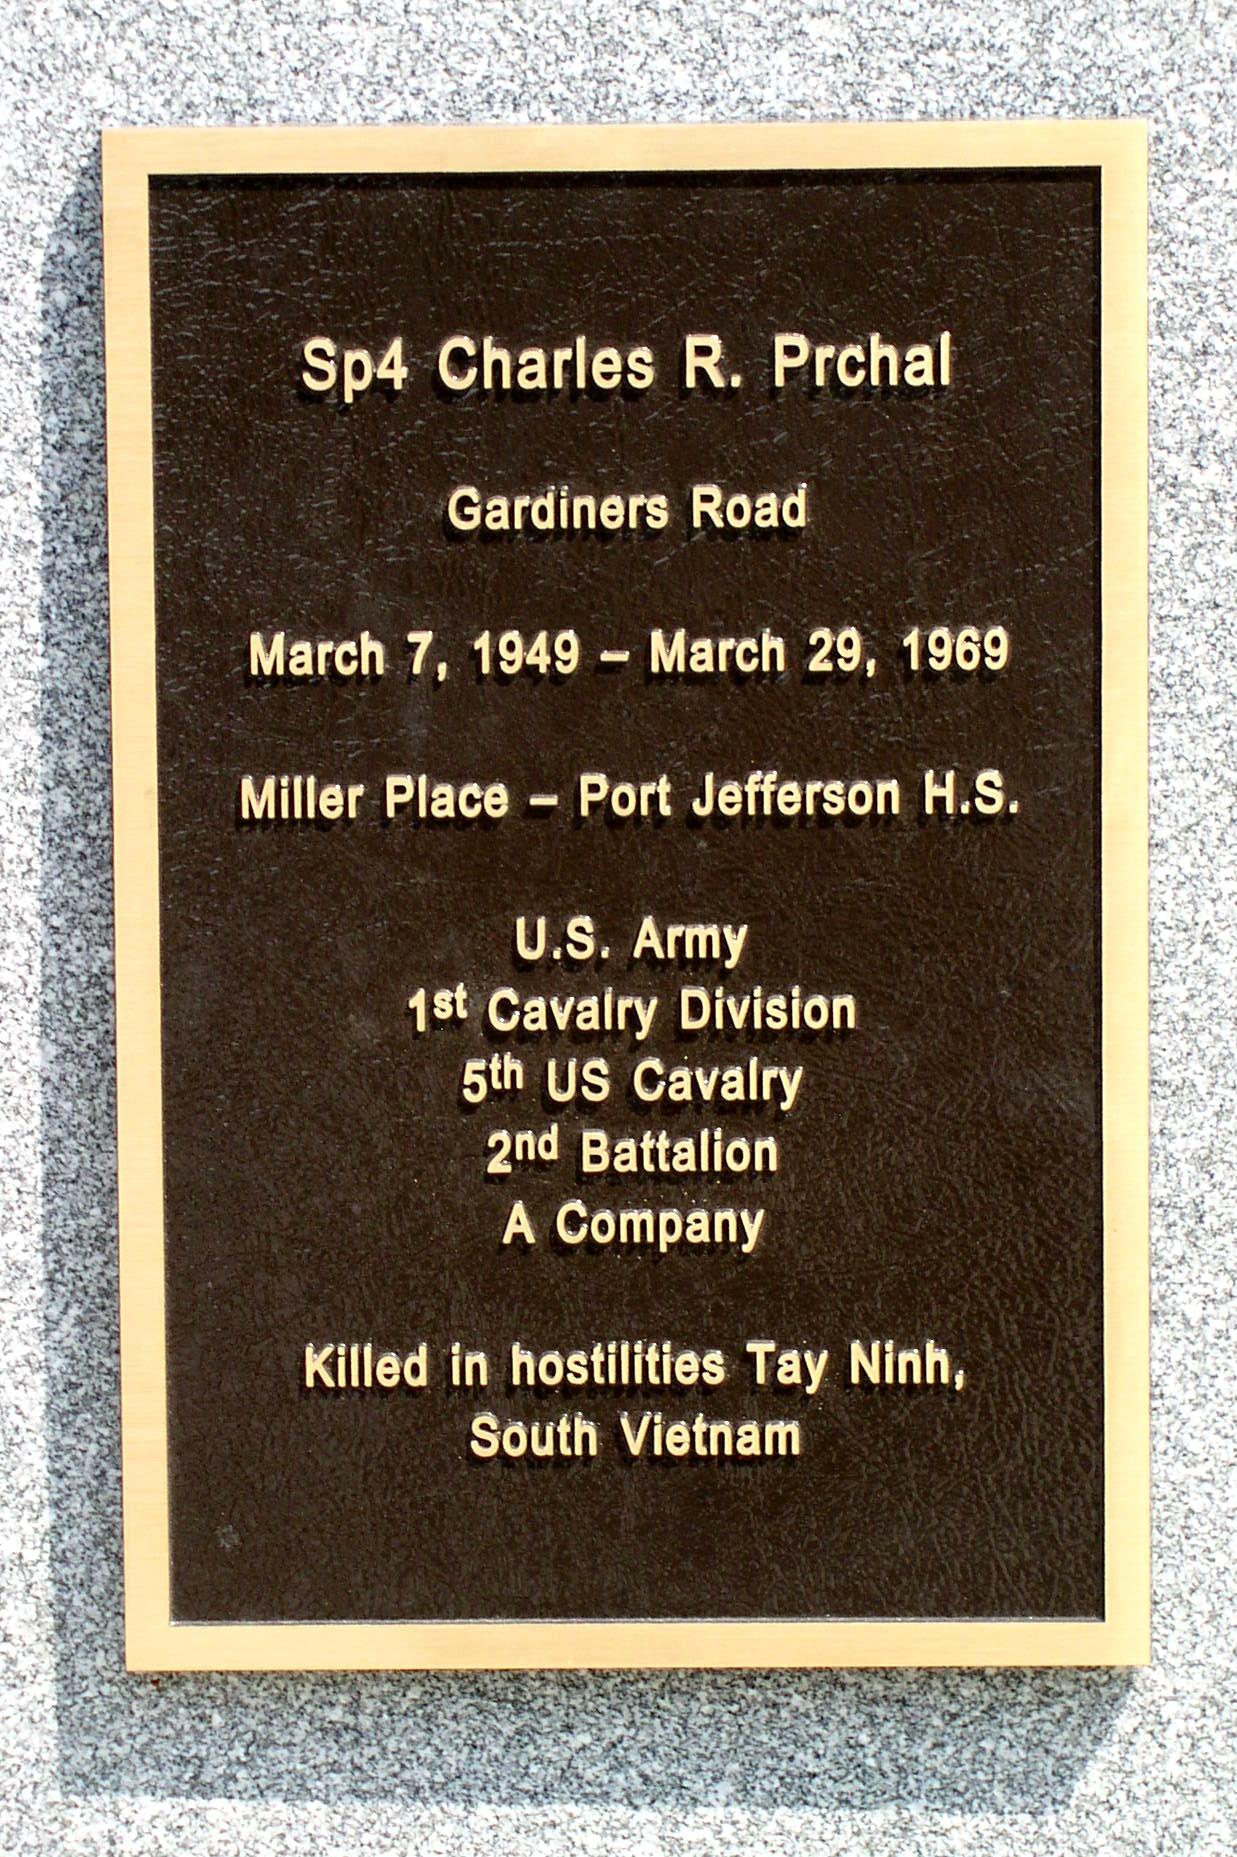 Charles Robert Charley Prchal